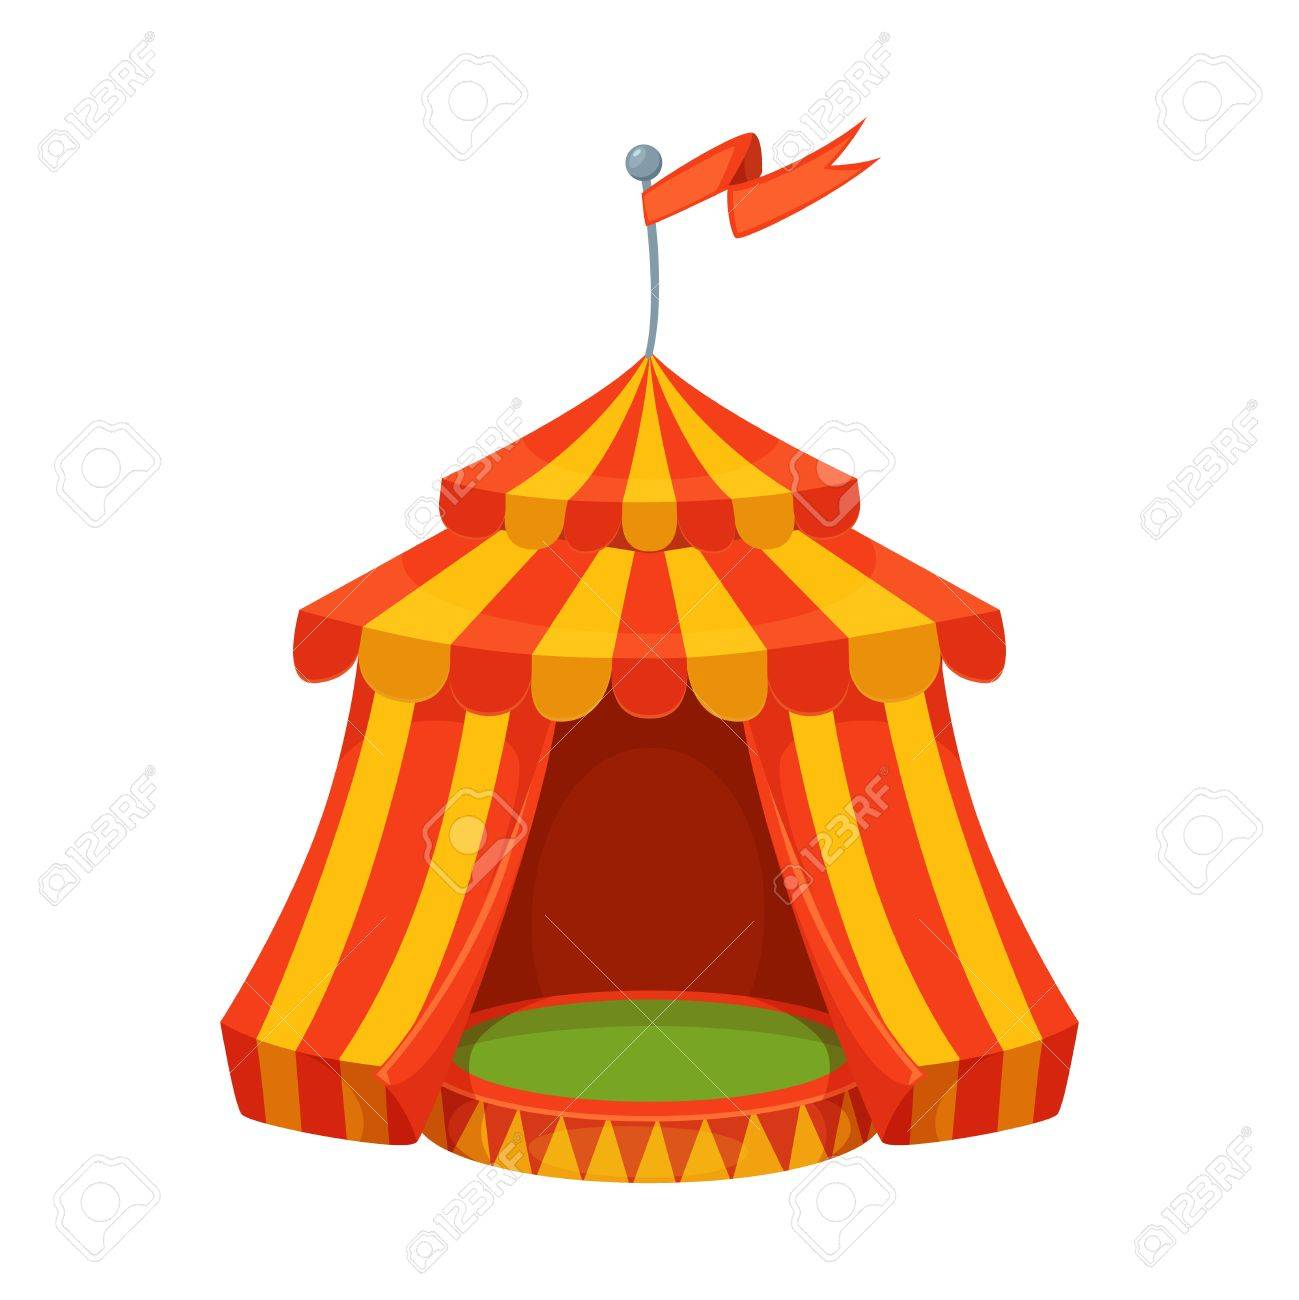 1299x1300 Cartoon Circus Tent Pictures  sc 1 st  ClipArtMag & Cartoon Tent | Free download best Cartoon Tent on ClipArtMag.com